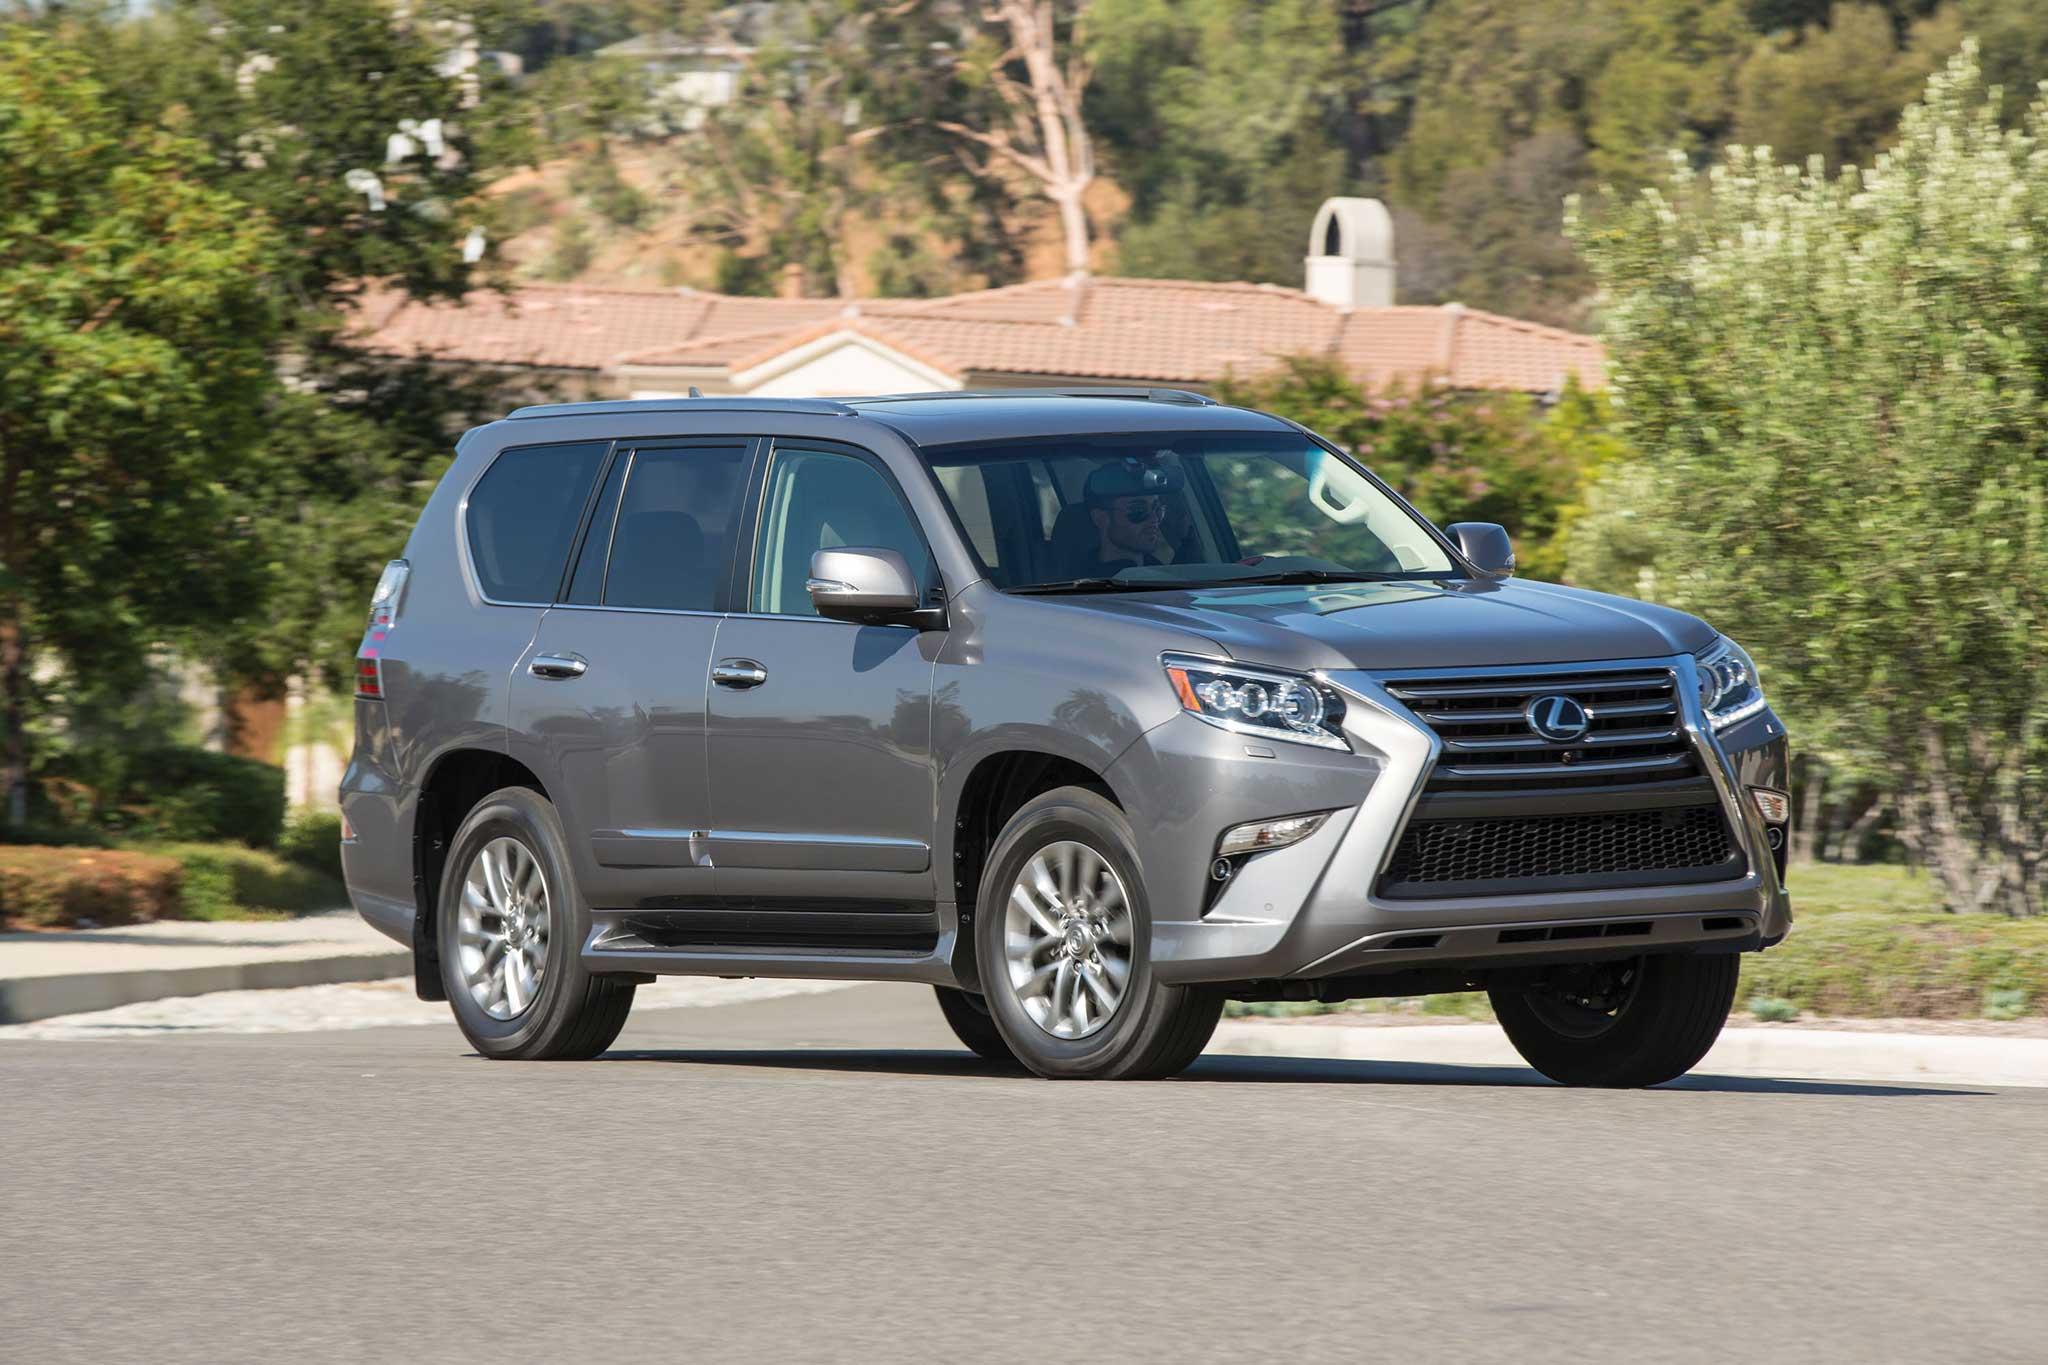 quarter reviews gx and rear abtl luxury suv autobytel com design test road lexus review